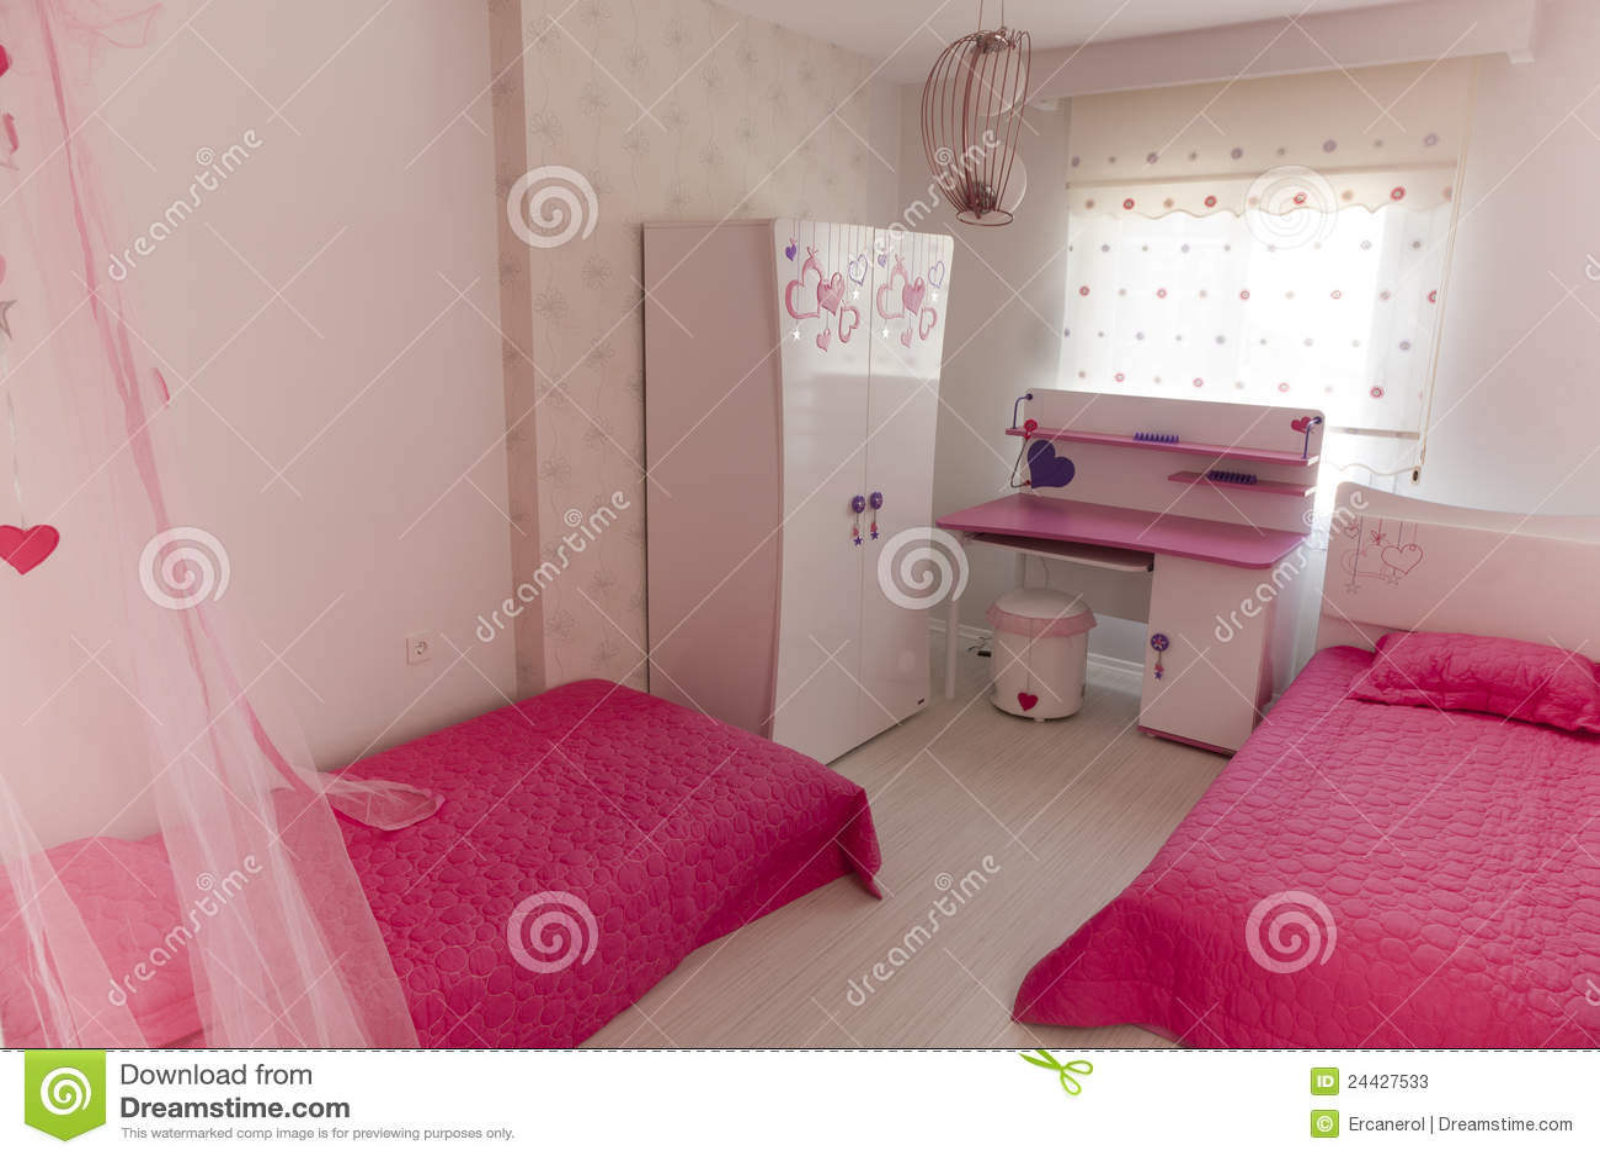 Roze slaapkamer bedden en bureau stock afbeelding afbeelding 24427533 for Foto slaapkamer baby meisje